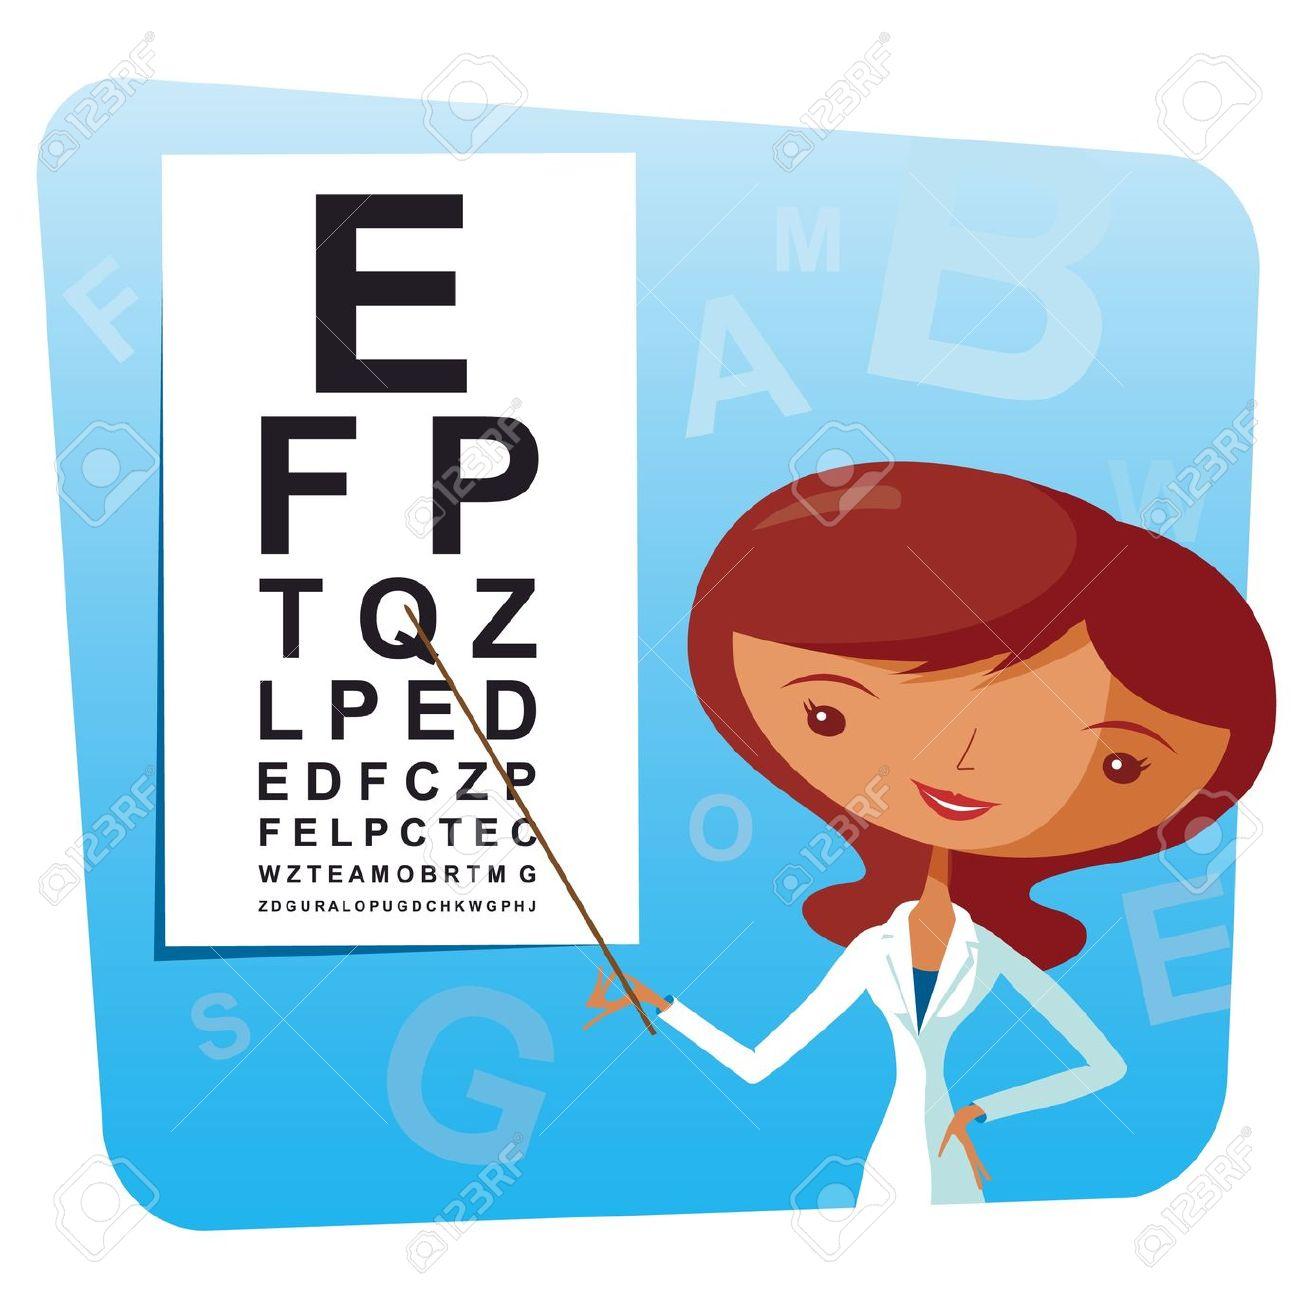 Eye Doctor: Eye Doctor-eye doctor: eye doctor-8